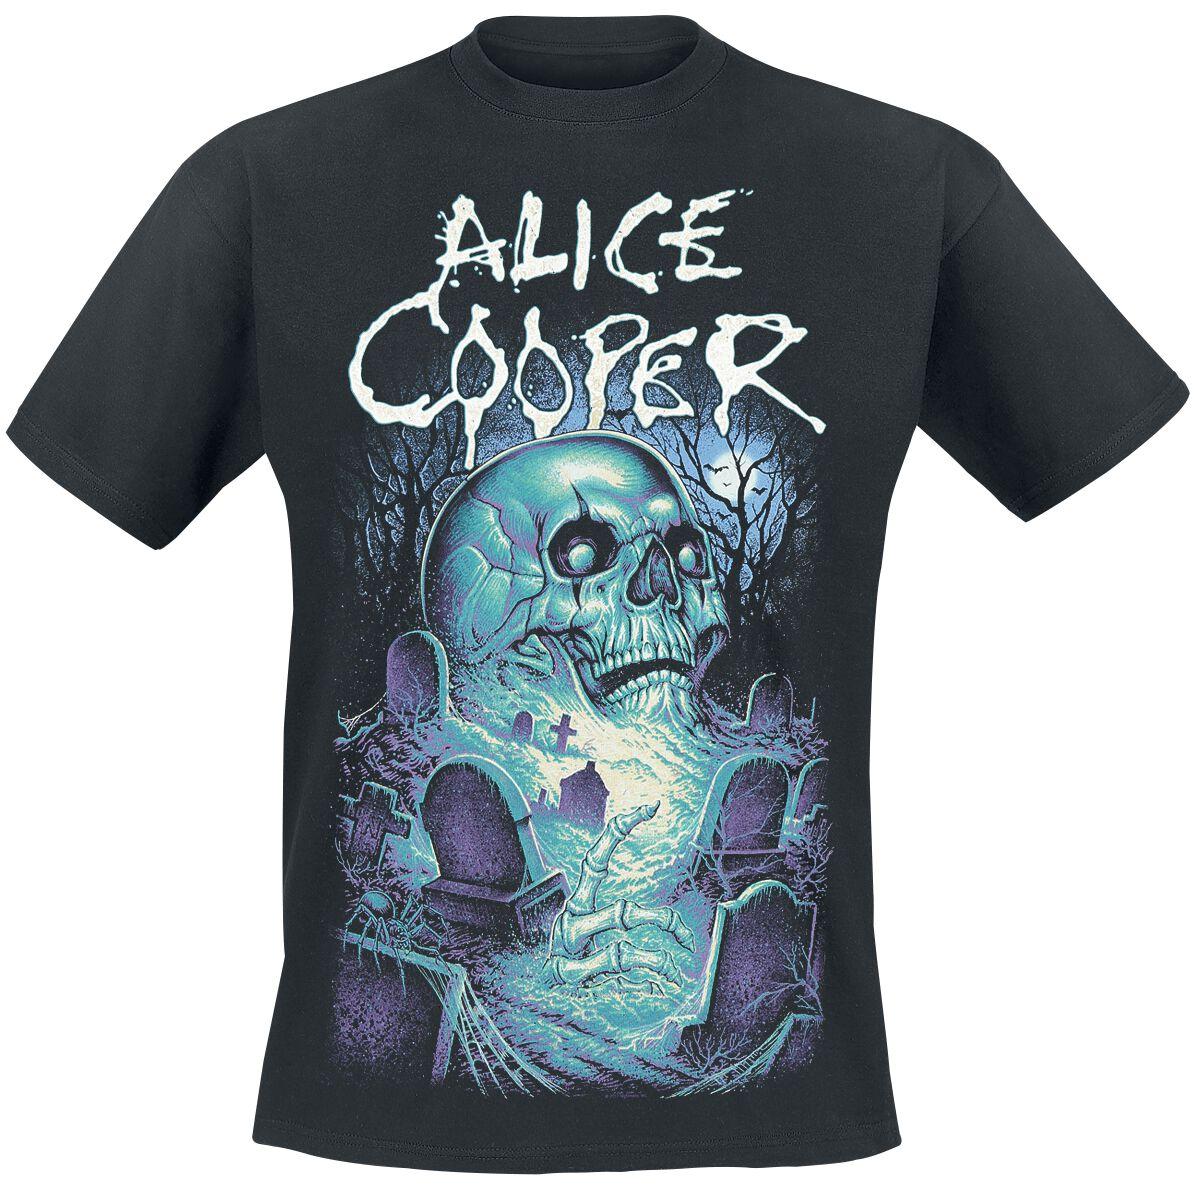 Zespoły - Koszulki - T-Shirt Alice Cooper Graveyard T-Shirt czarny - 358609